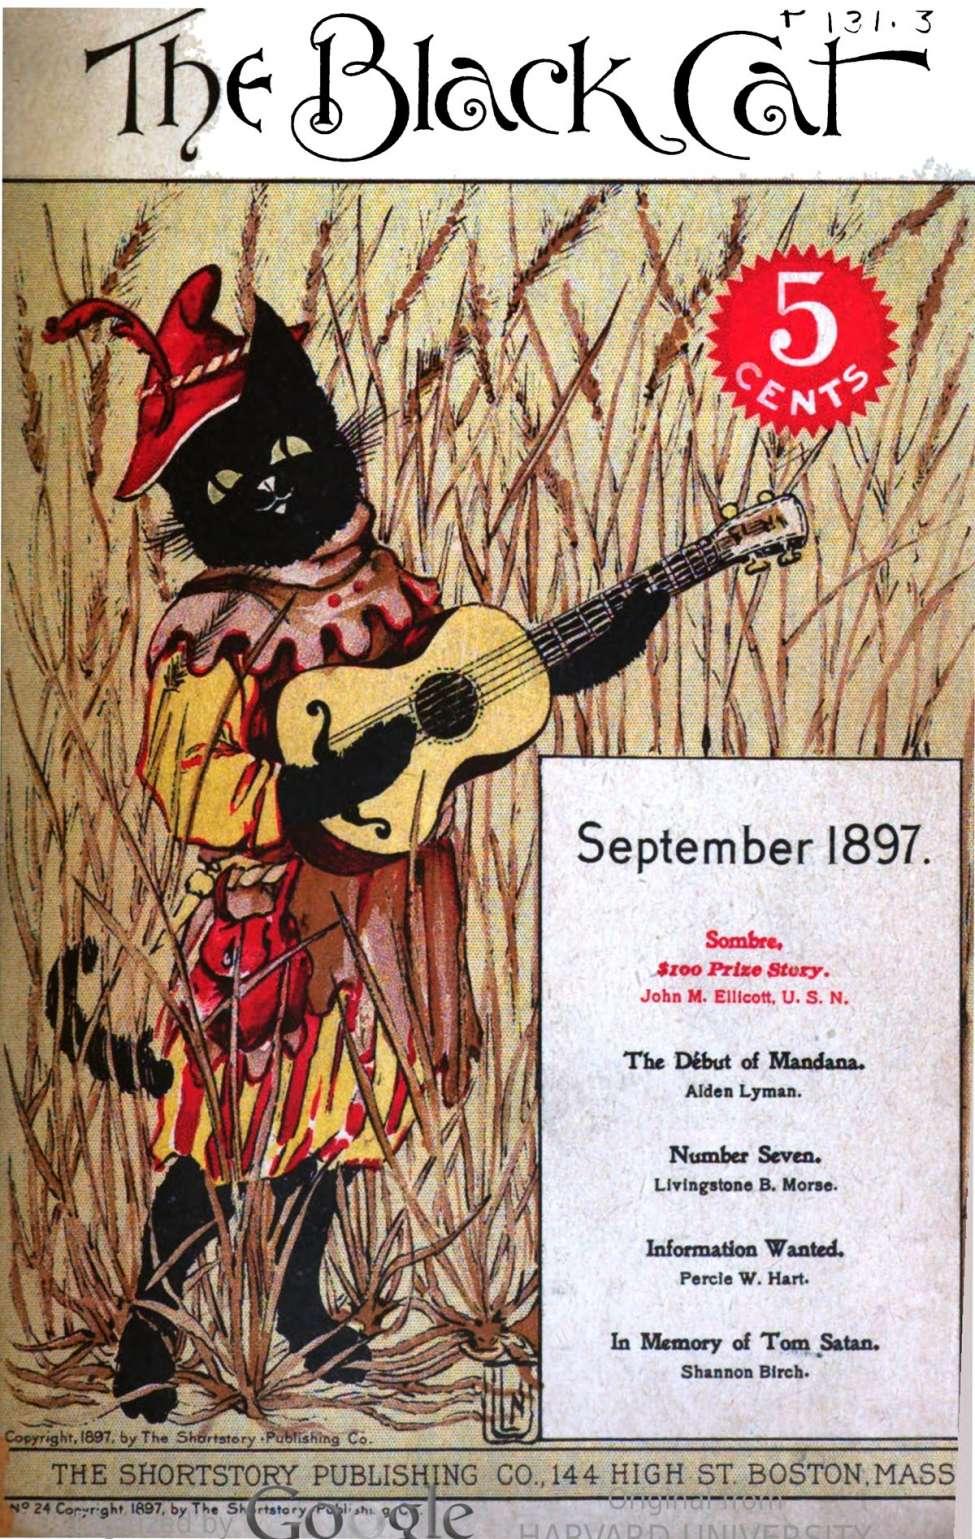 Comic Book Cover For The Black Cat 024 - Sombre - John M. Ellicott U.S.N.